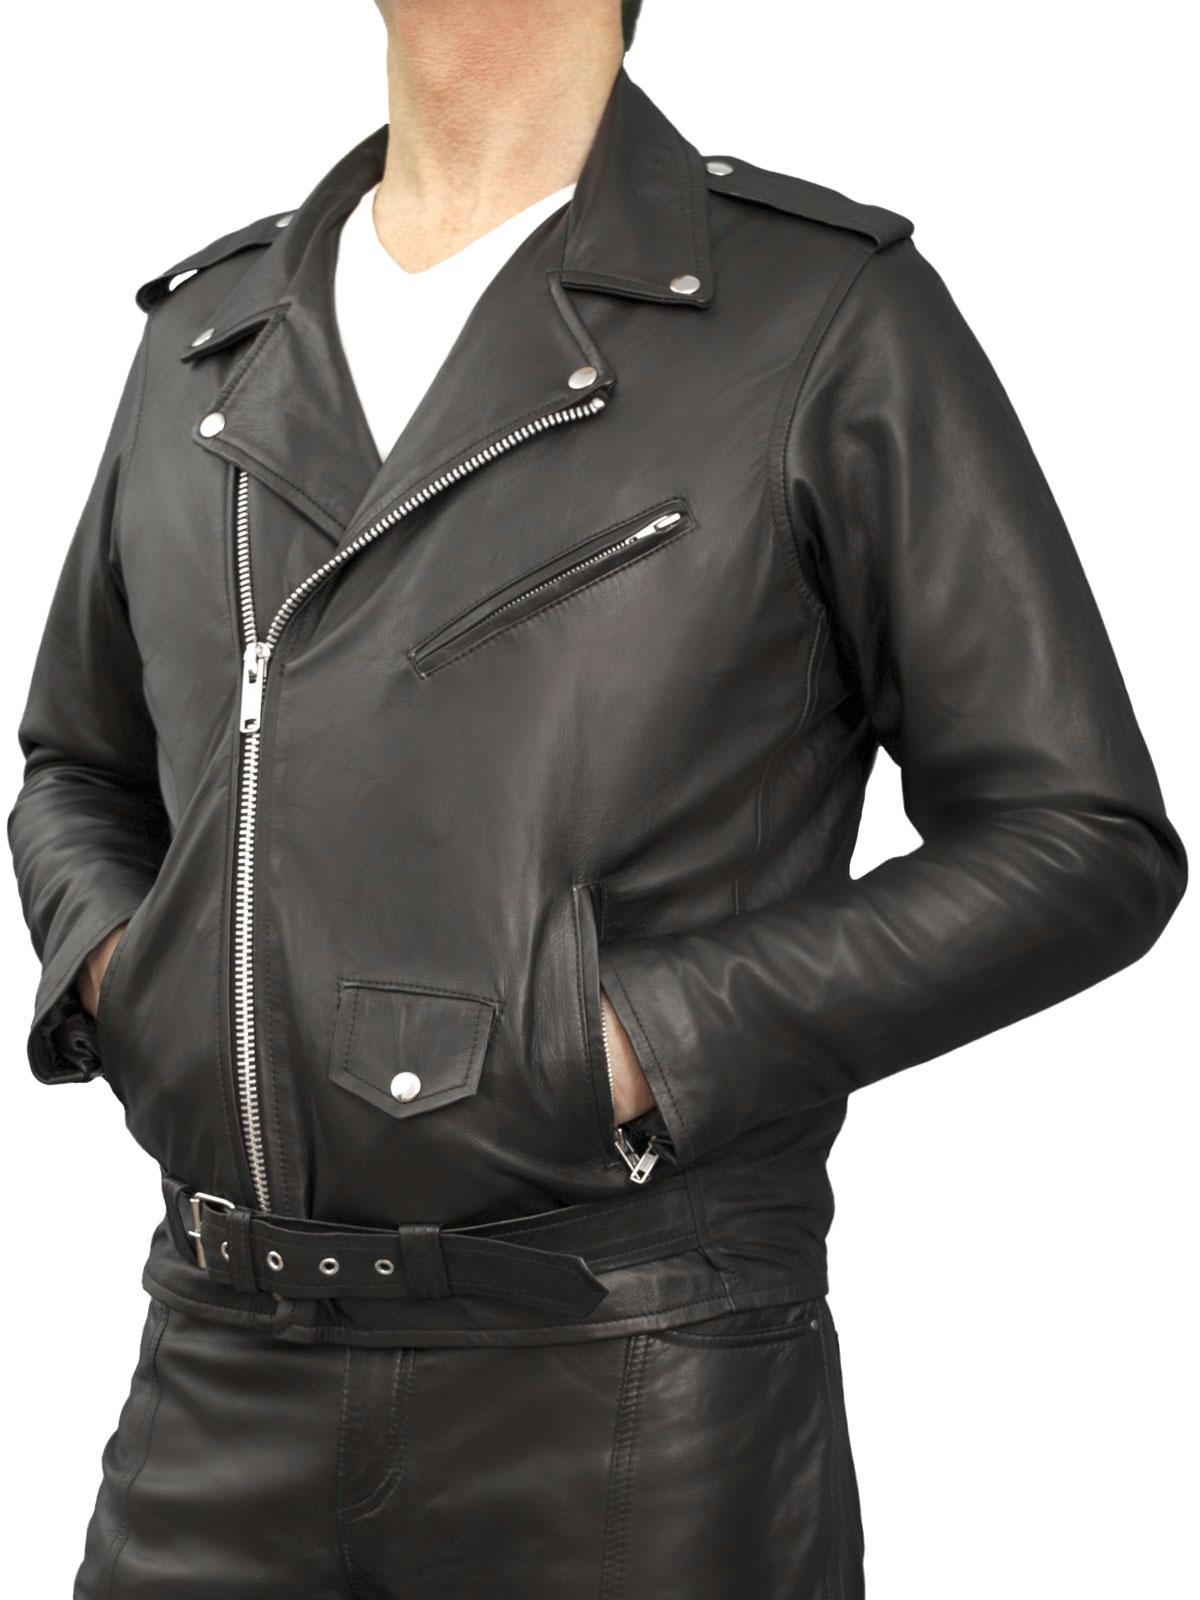 Mens Marlon Brando Black Leather Jacket Tout Ensemble